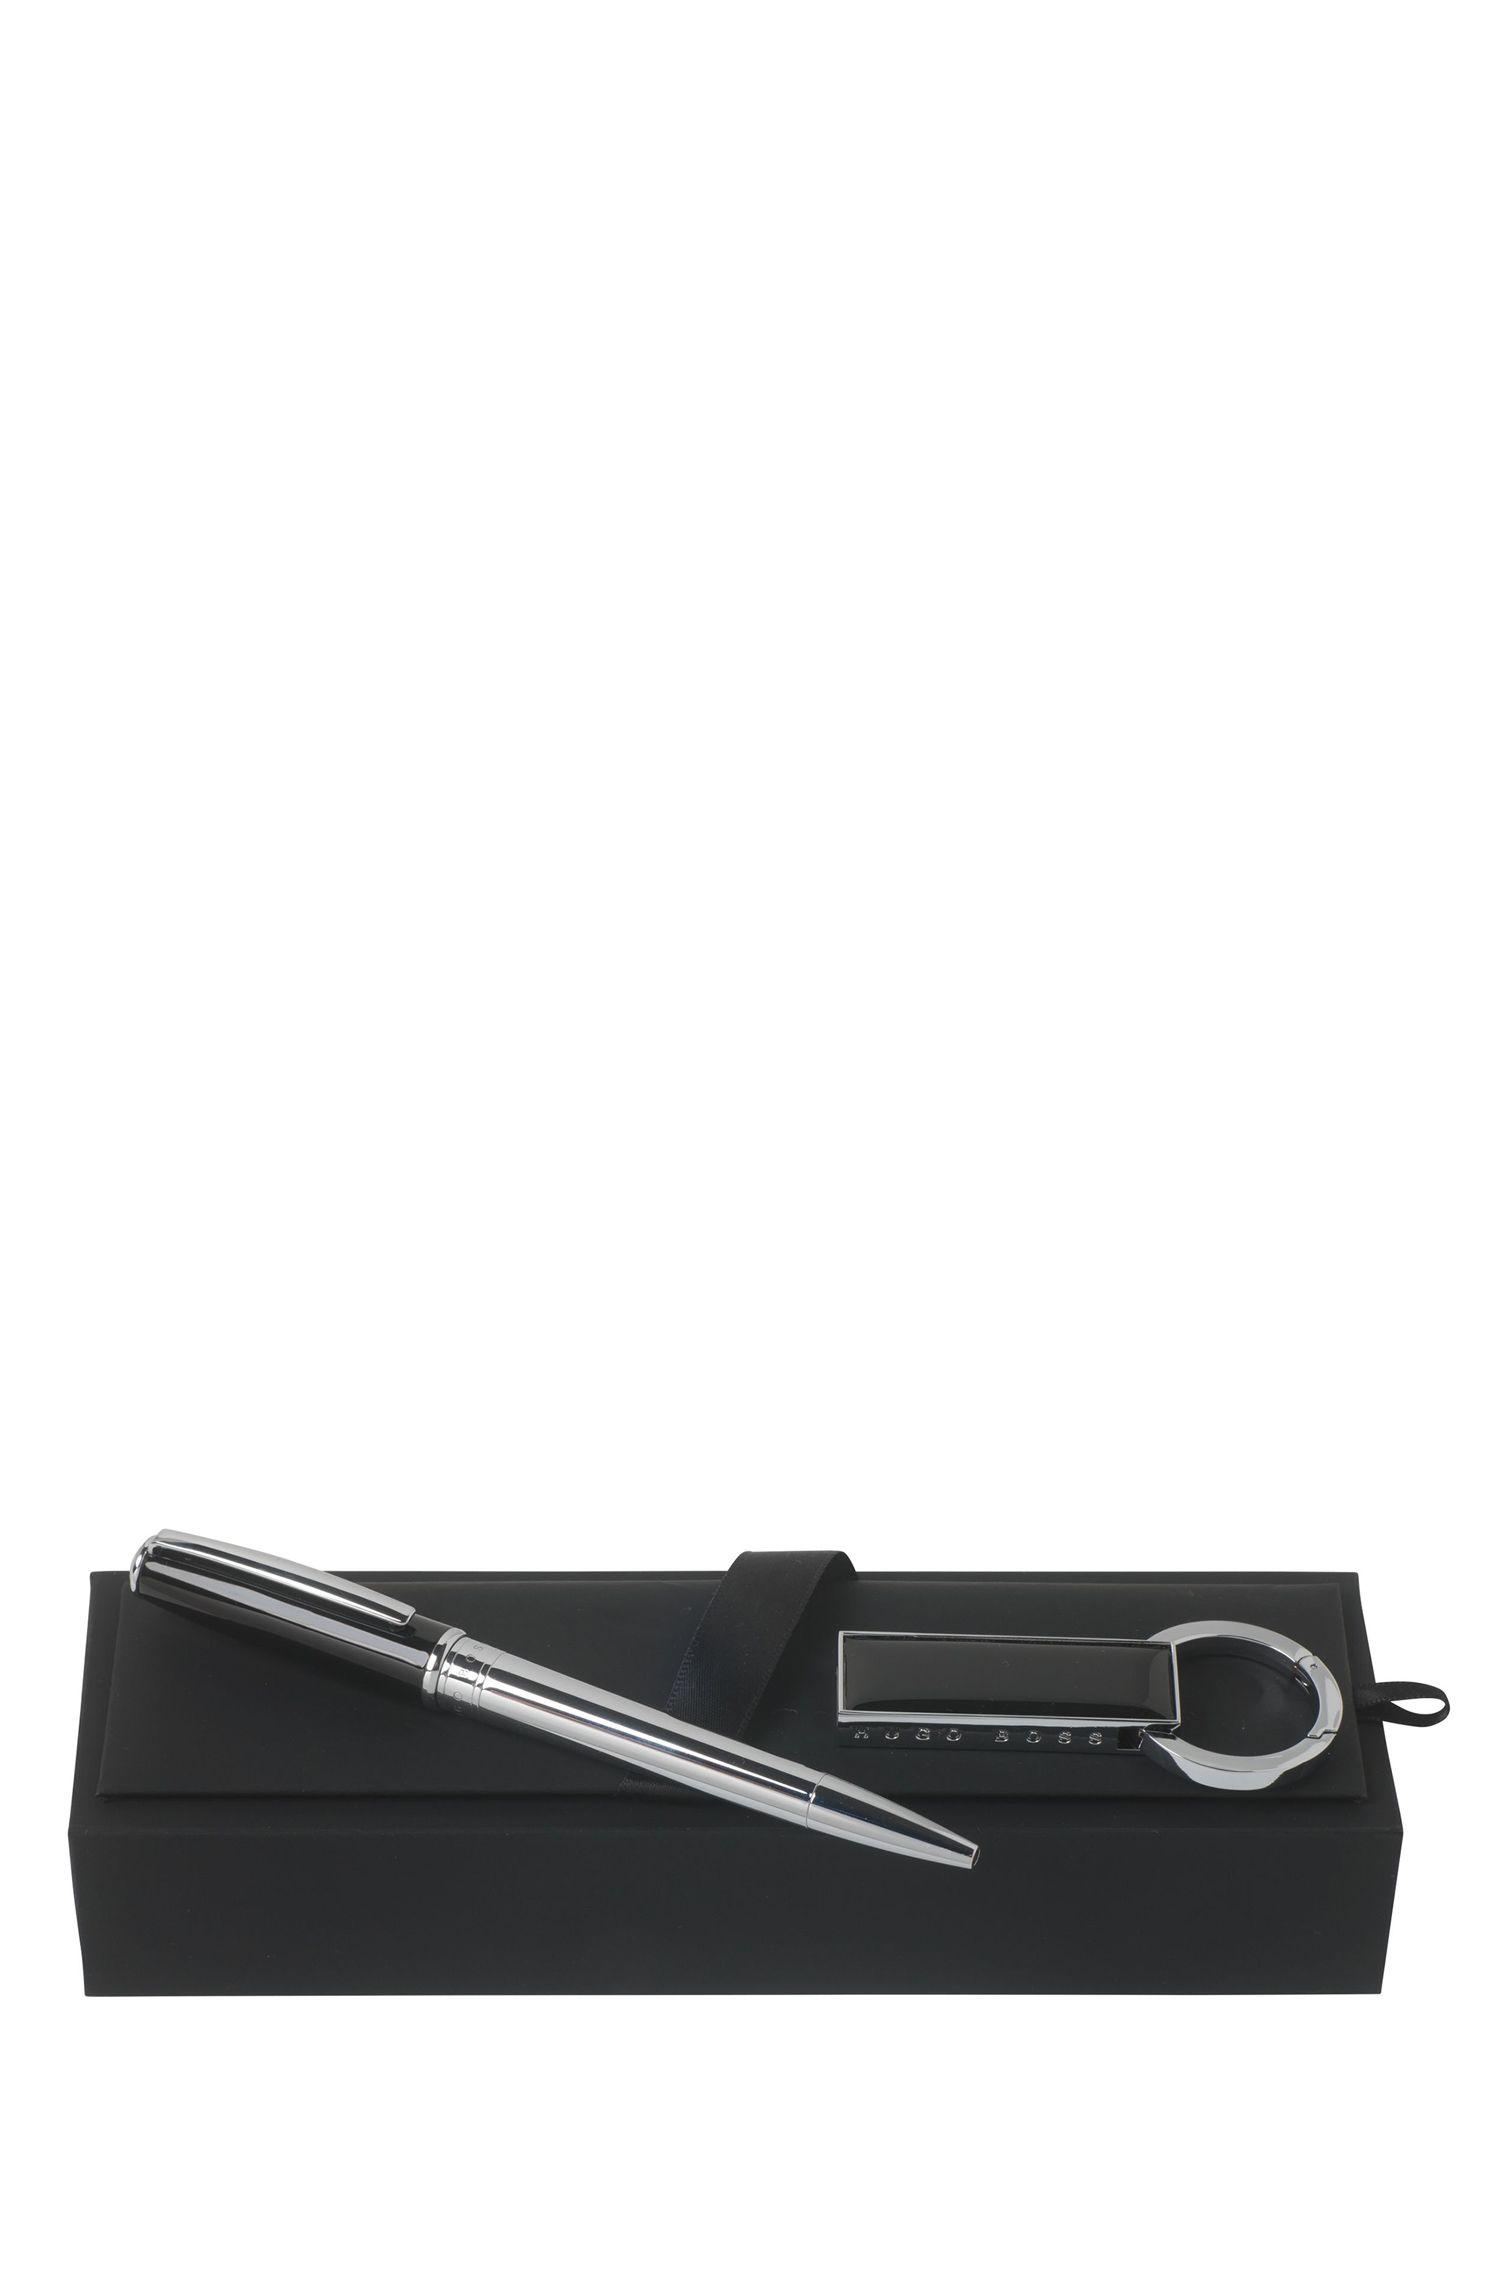 Brass Ballpoint Ben, USB Stick Set | Essential Set, Black